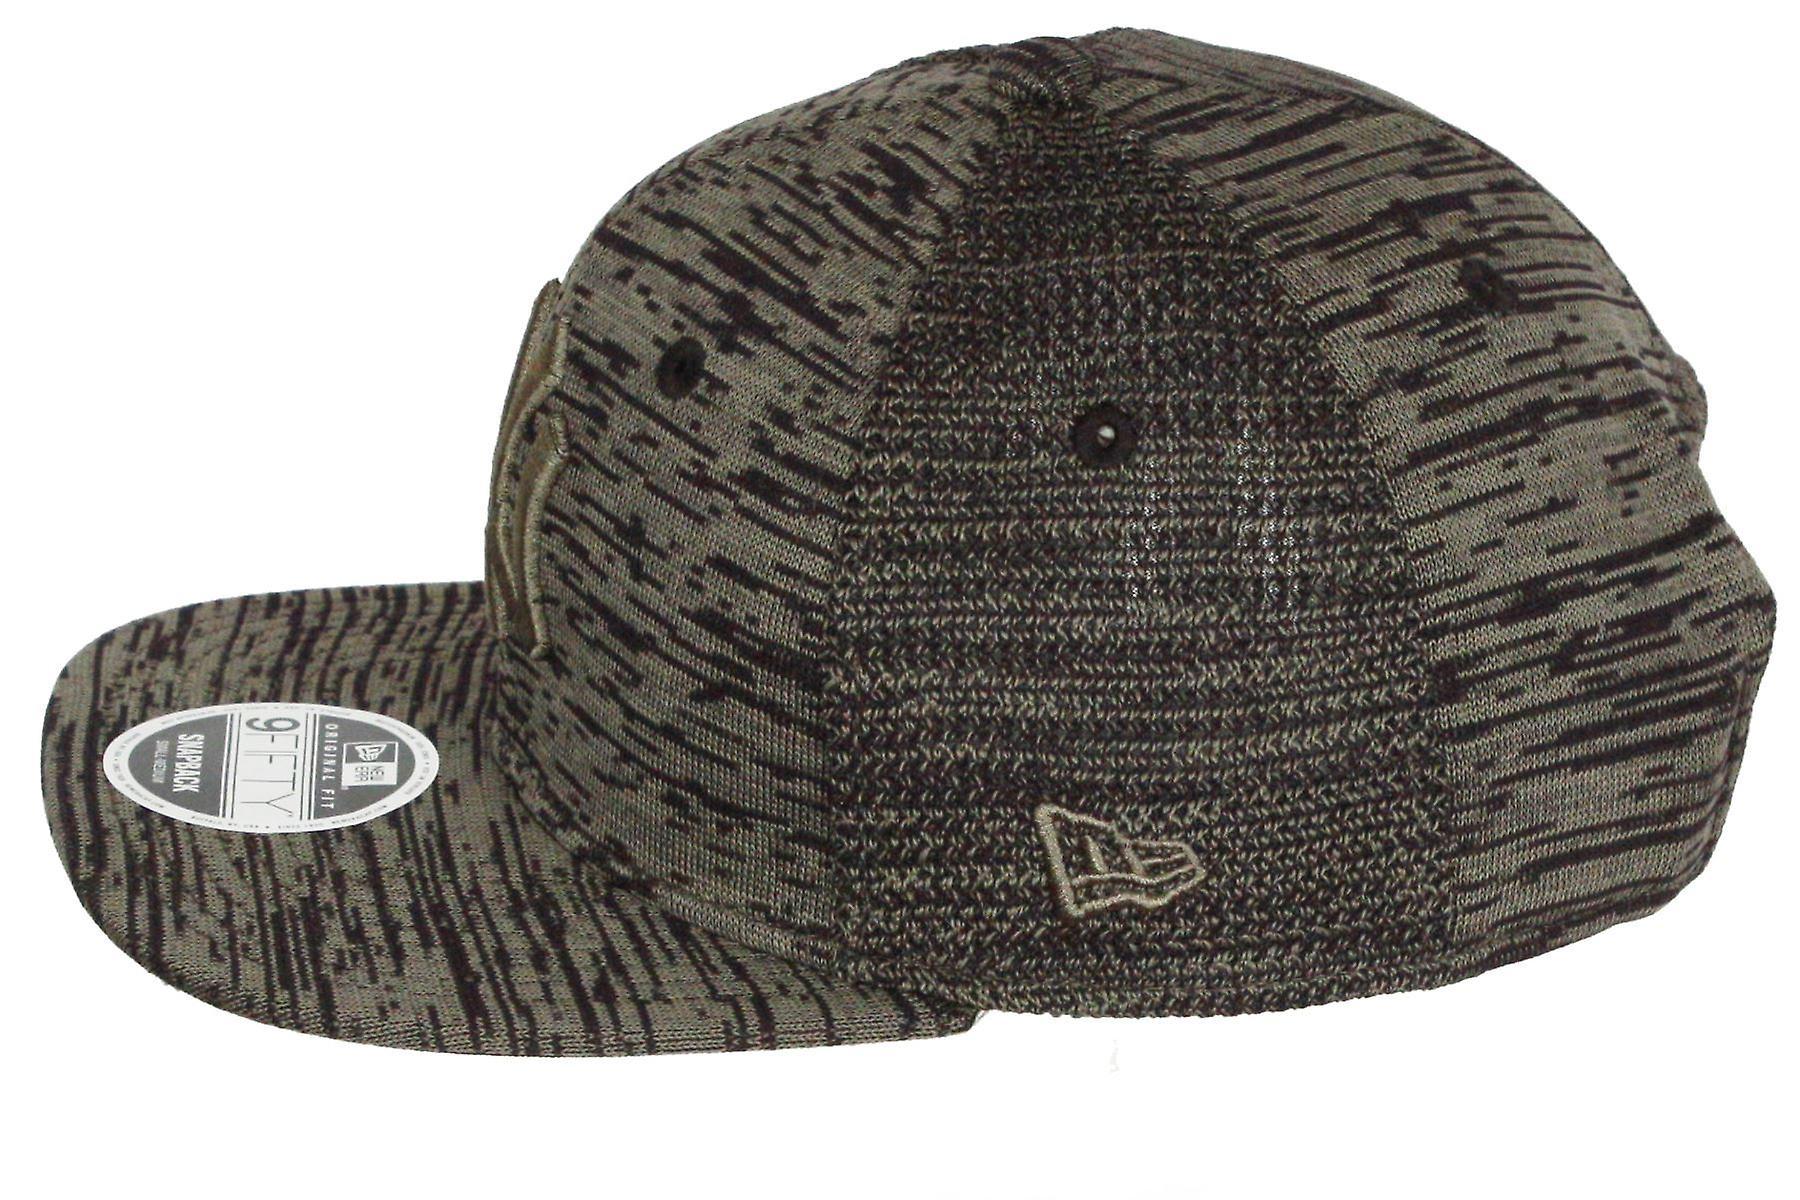 New Era Adjustable Engineered Fit 9Fifty Cap ~ New York Yankees